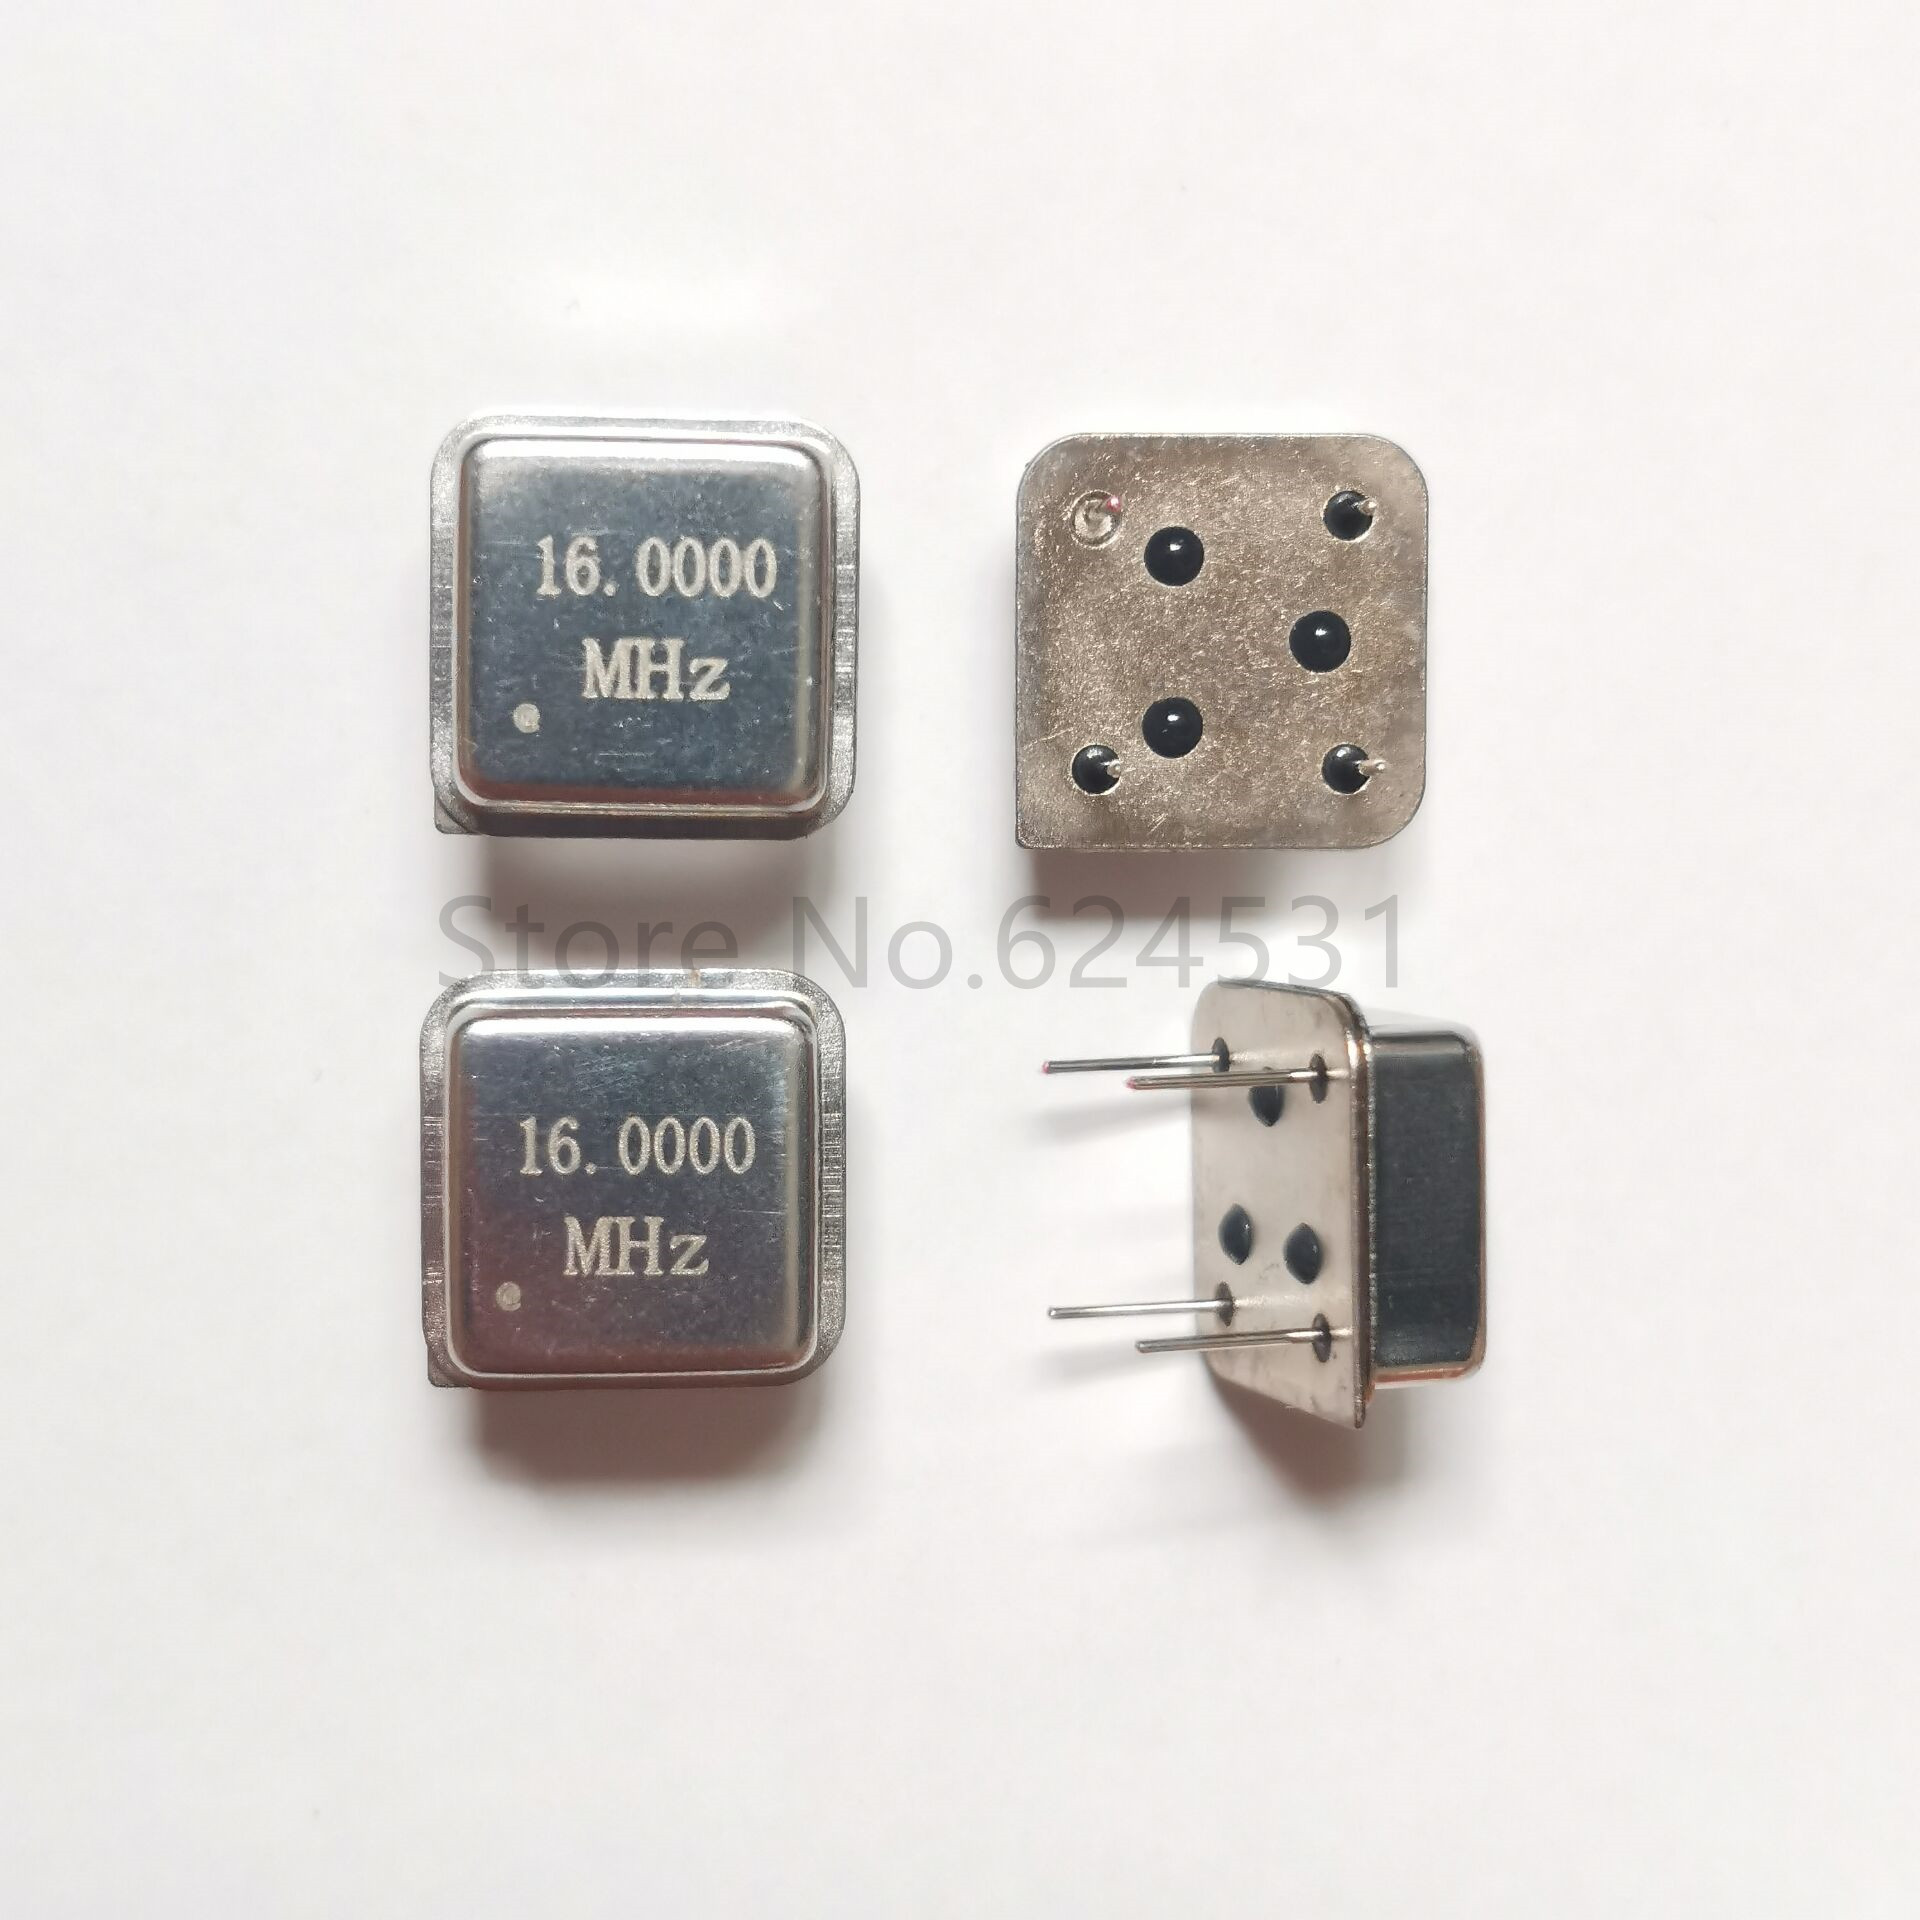 10pcs In-line Active Crystal Oscillator Clock Square Half Size DIP-4 OSC 16MHZ 16.000MHZ 16M